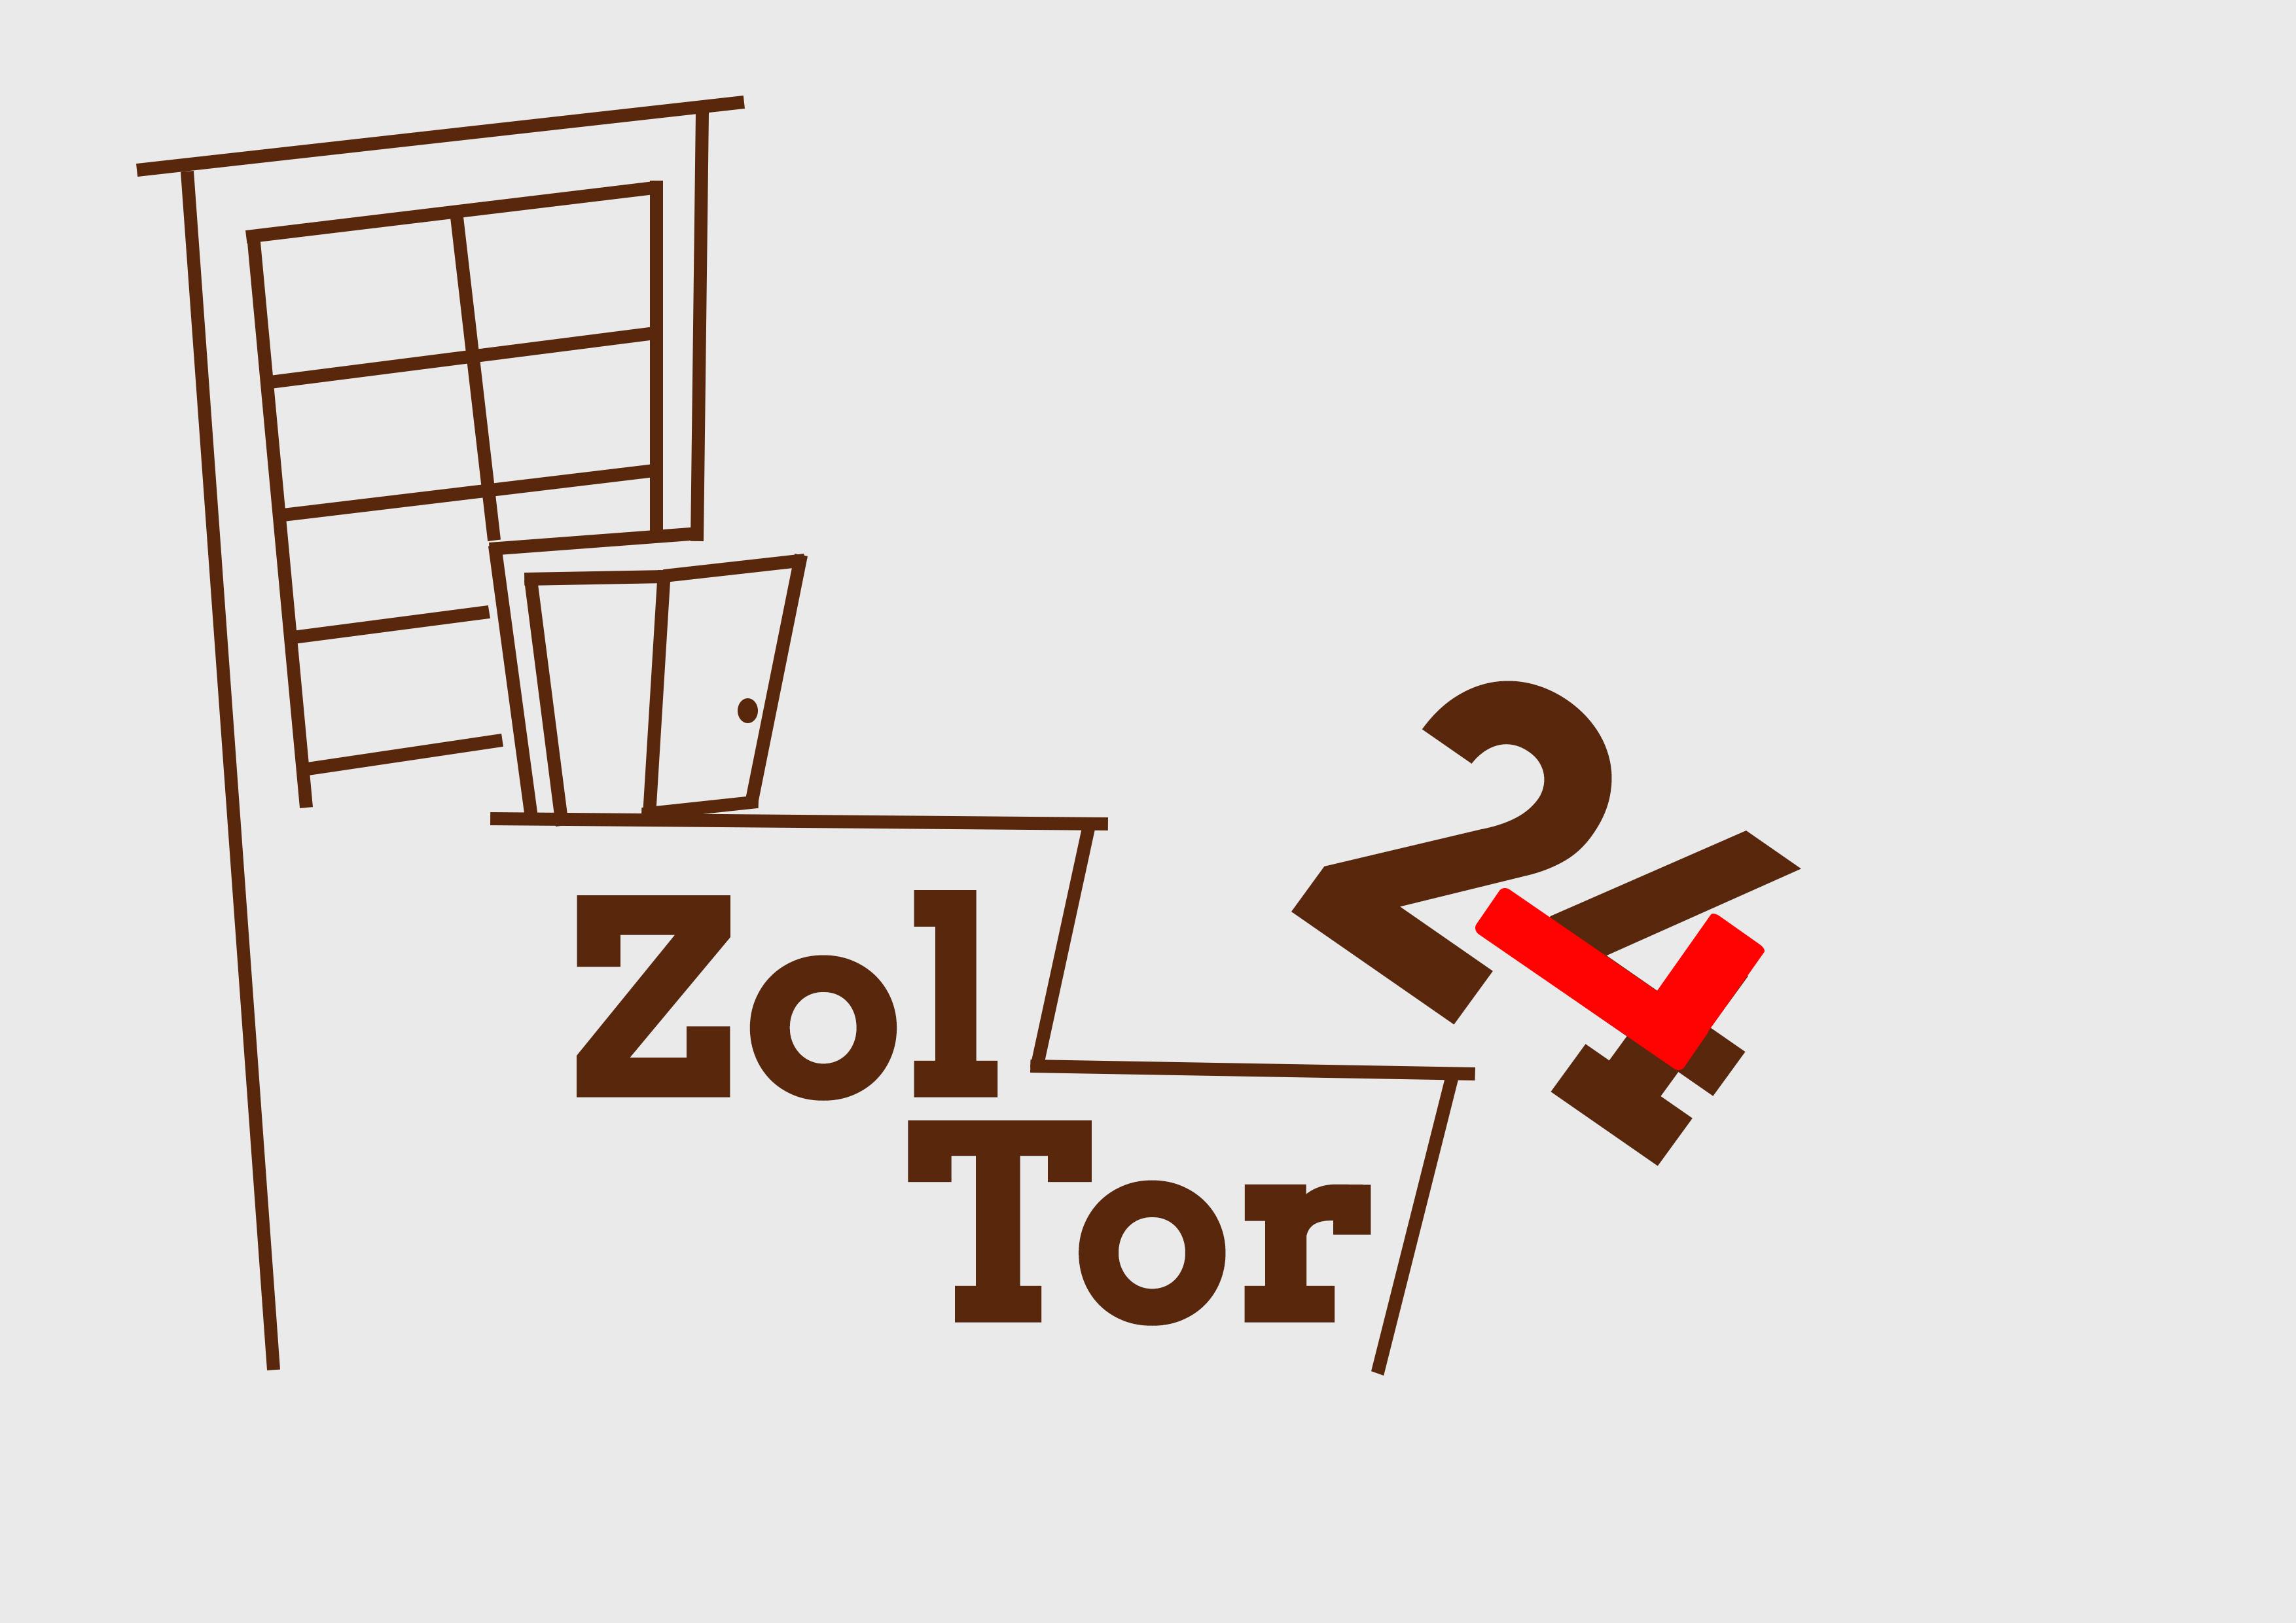 Логотип и фирменный стиль ZolTor24 фото f_6835c8684e8f1dec.jpg